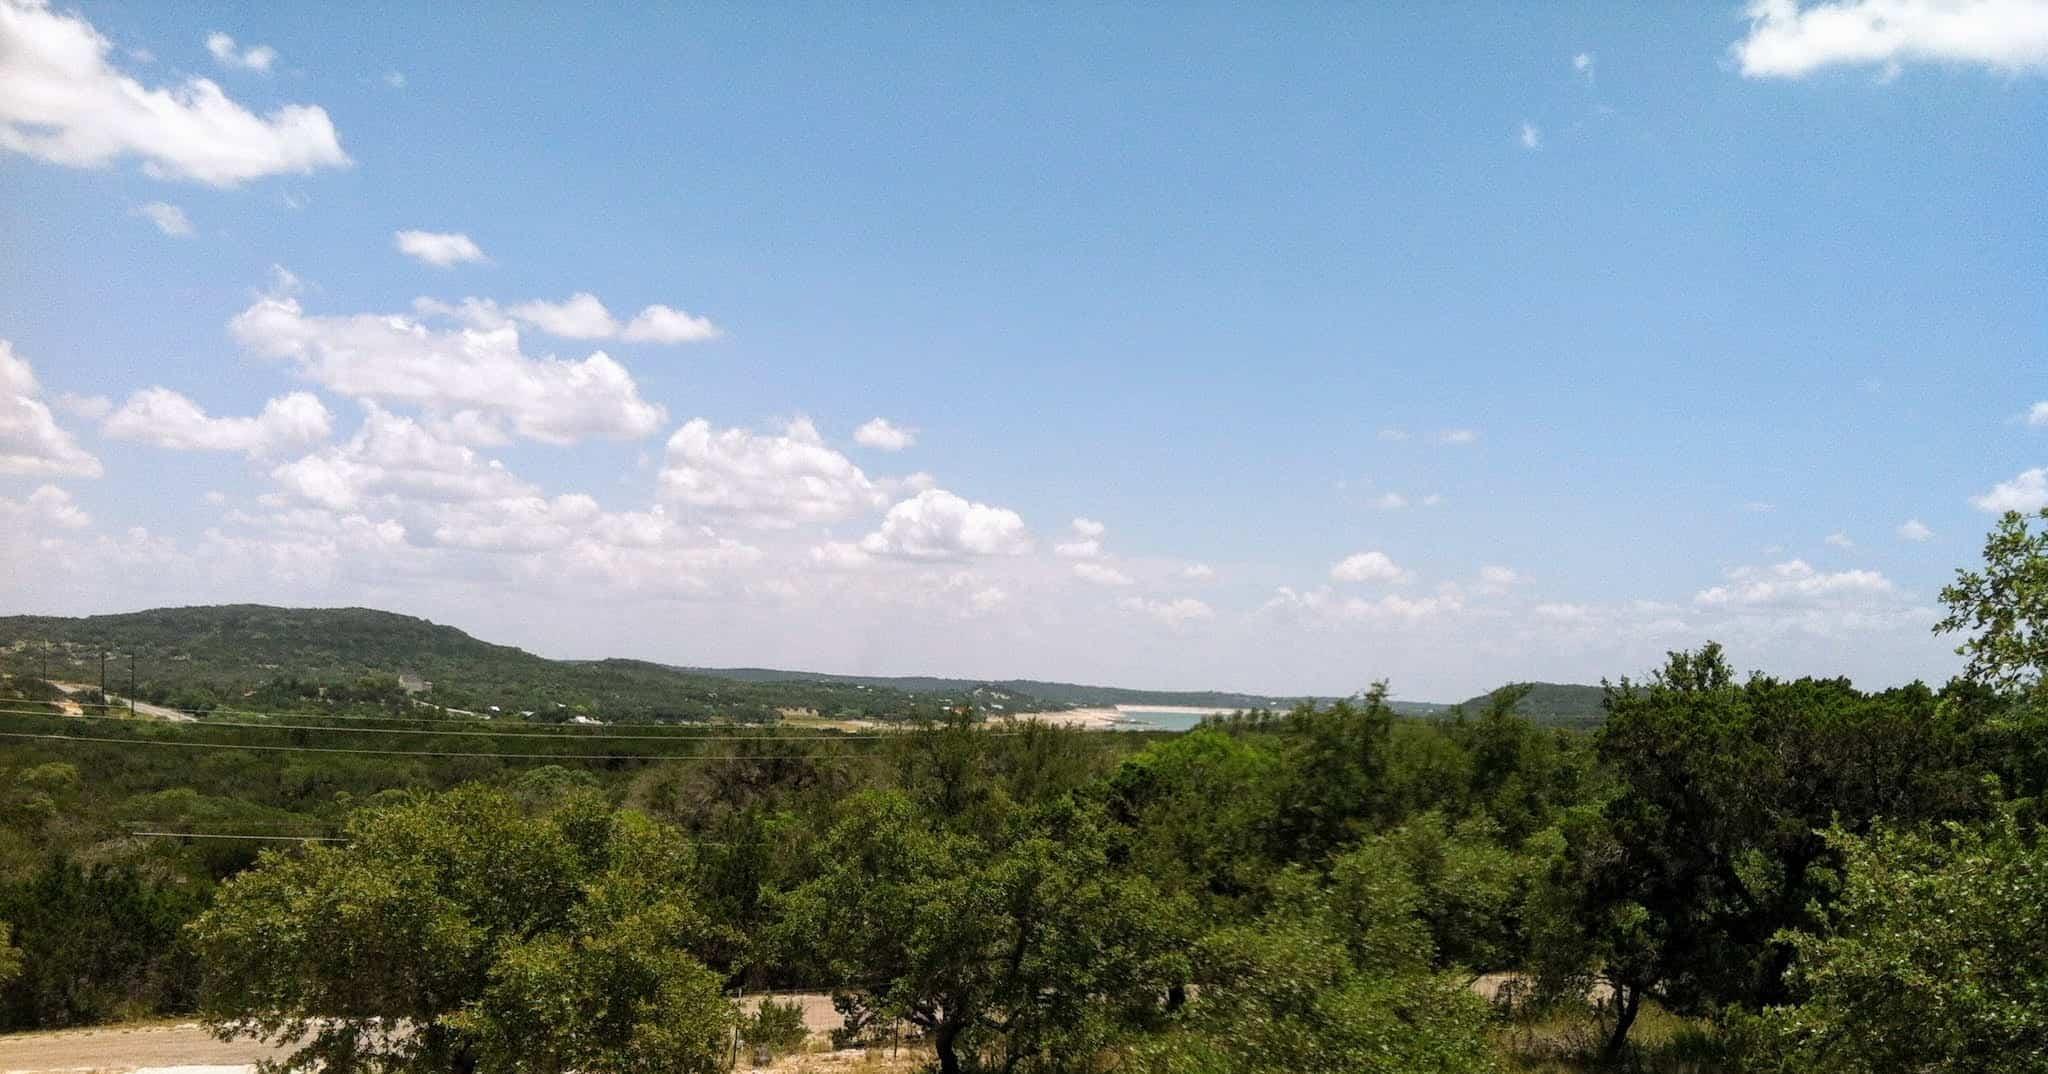 scenic view of Medina Lake in Lakehills, Texas